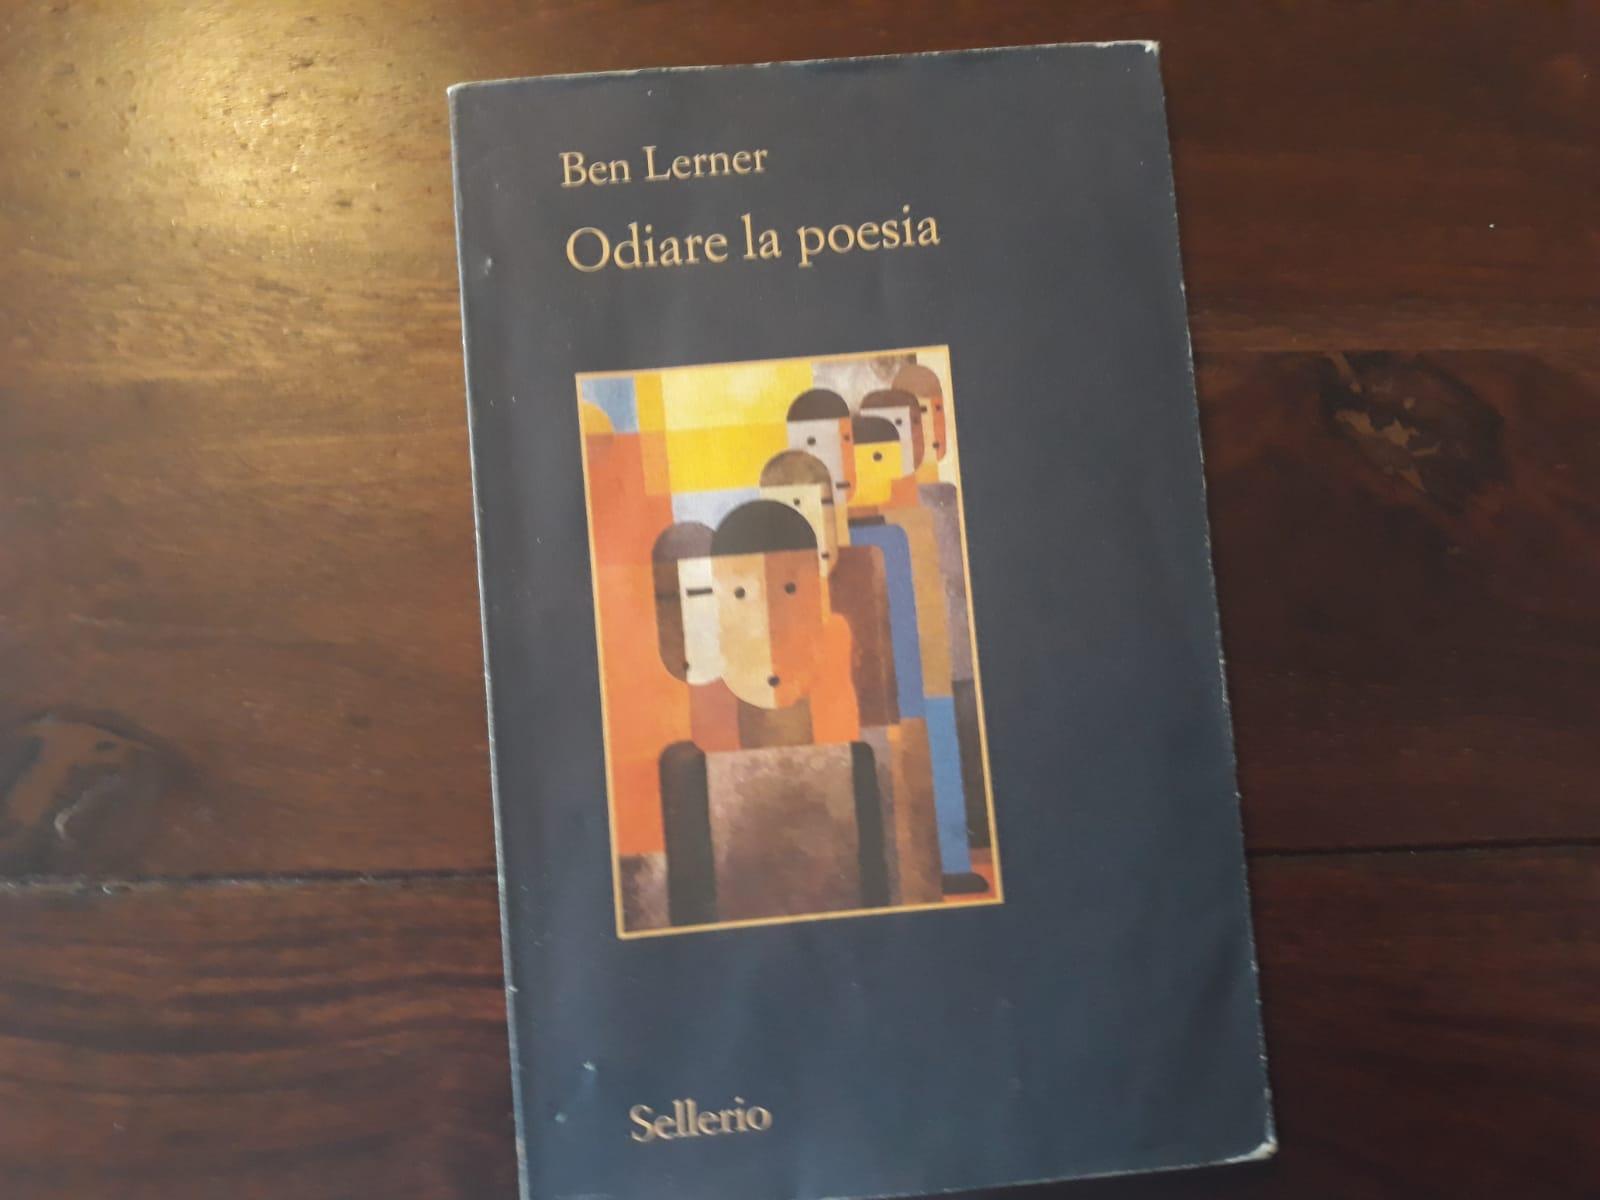 Ben Lerner, Odiare la poesia, Sellerio